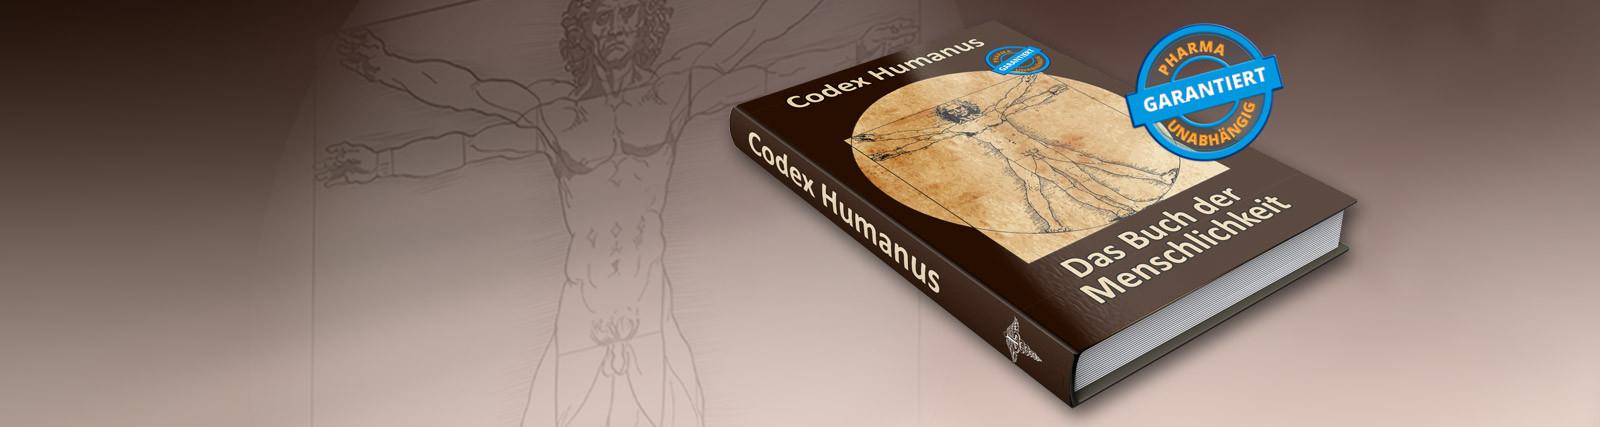 Codex Humanus